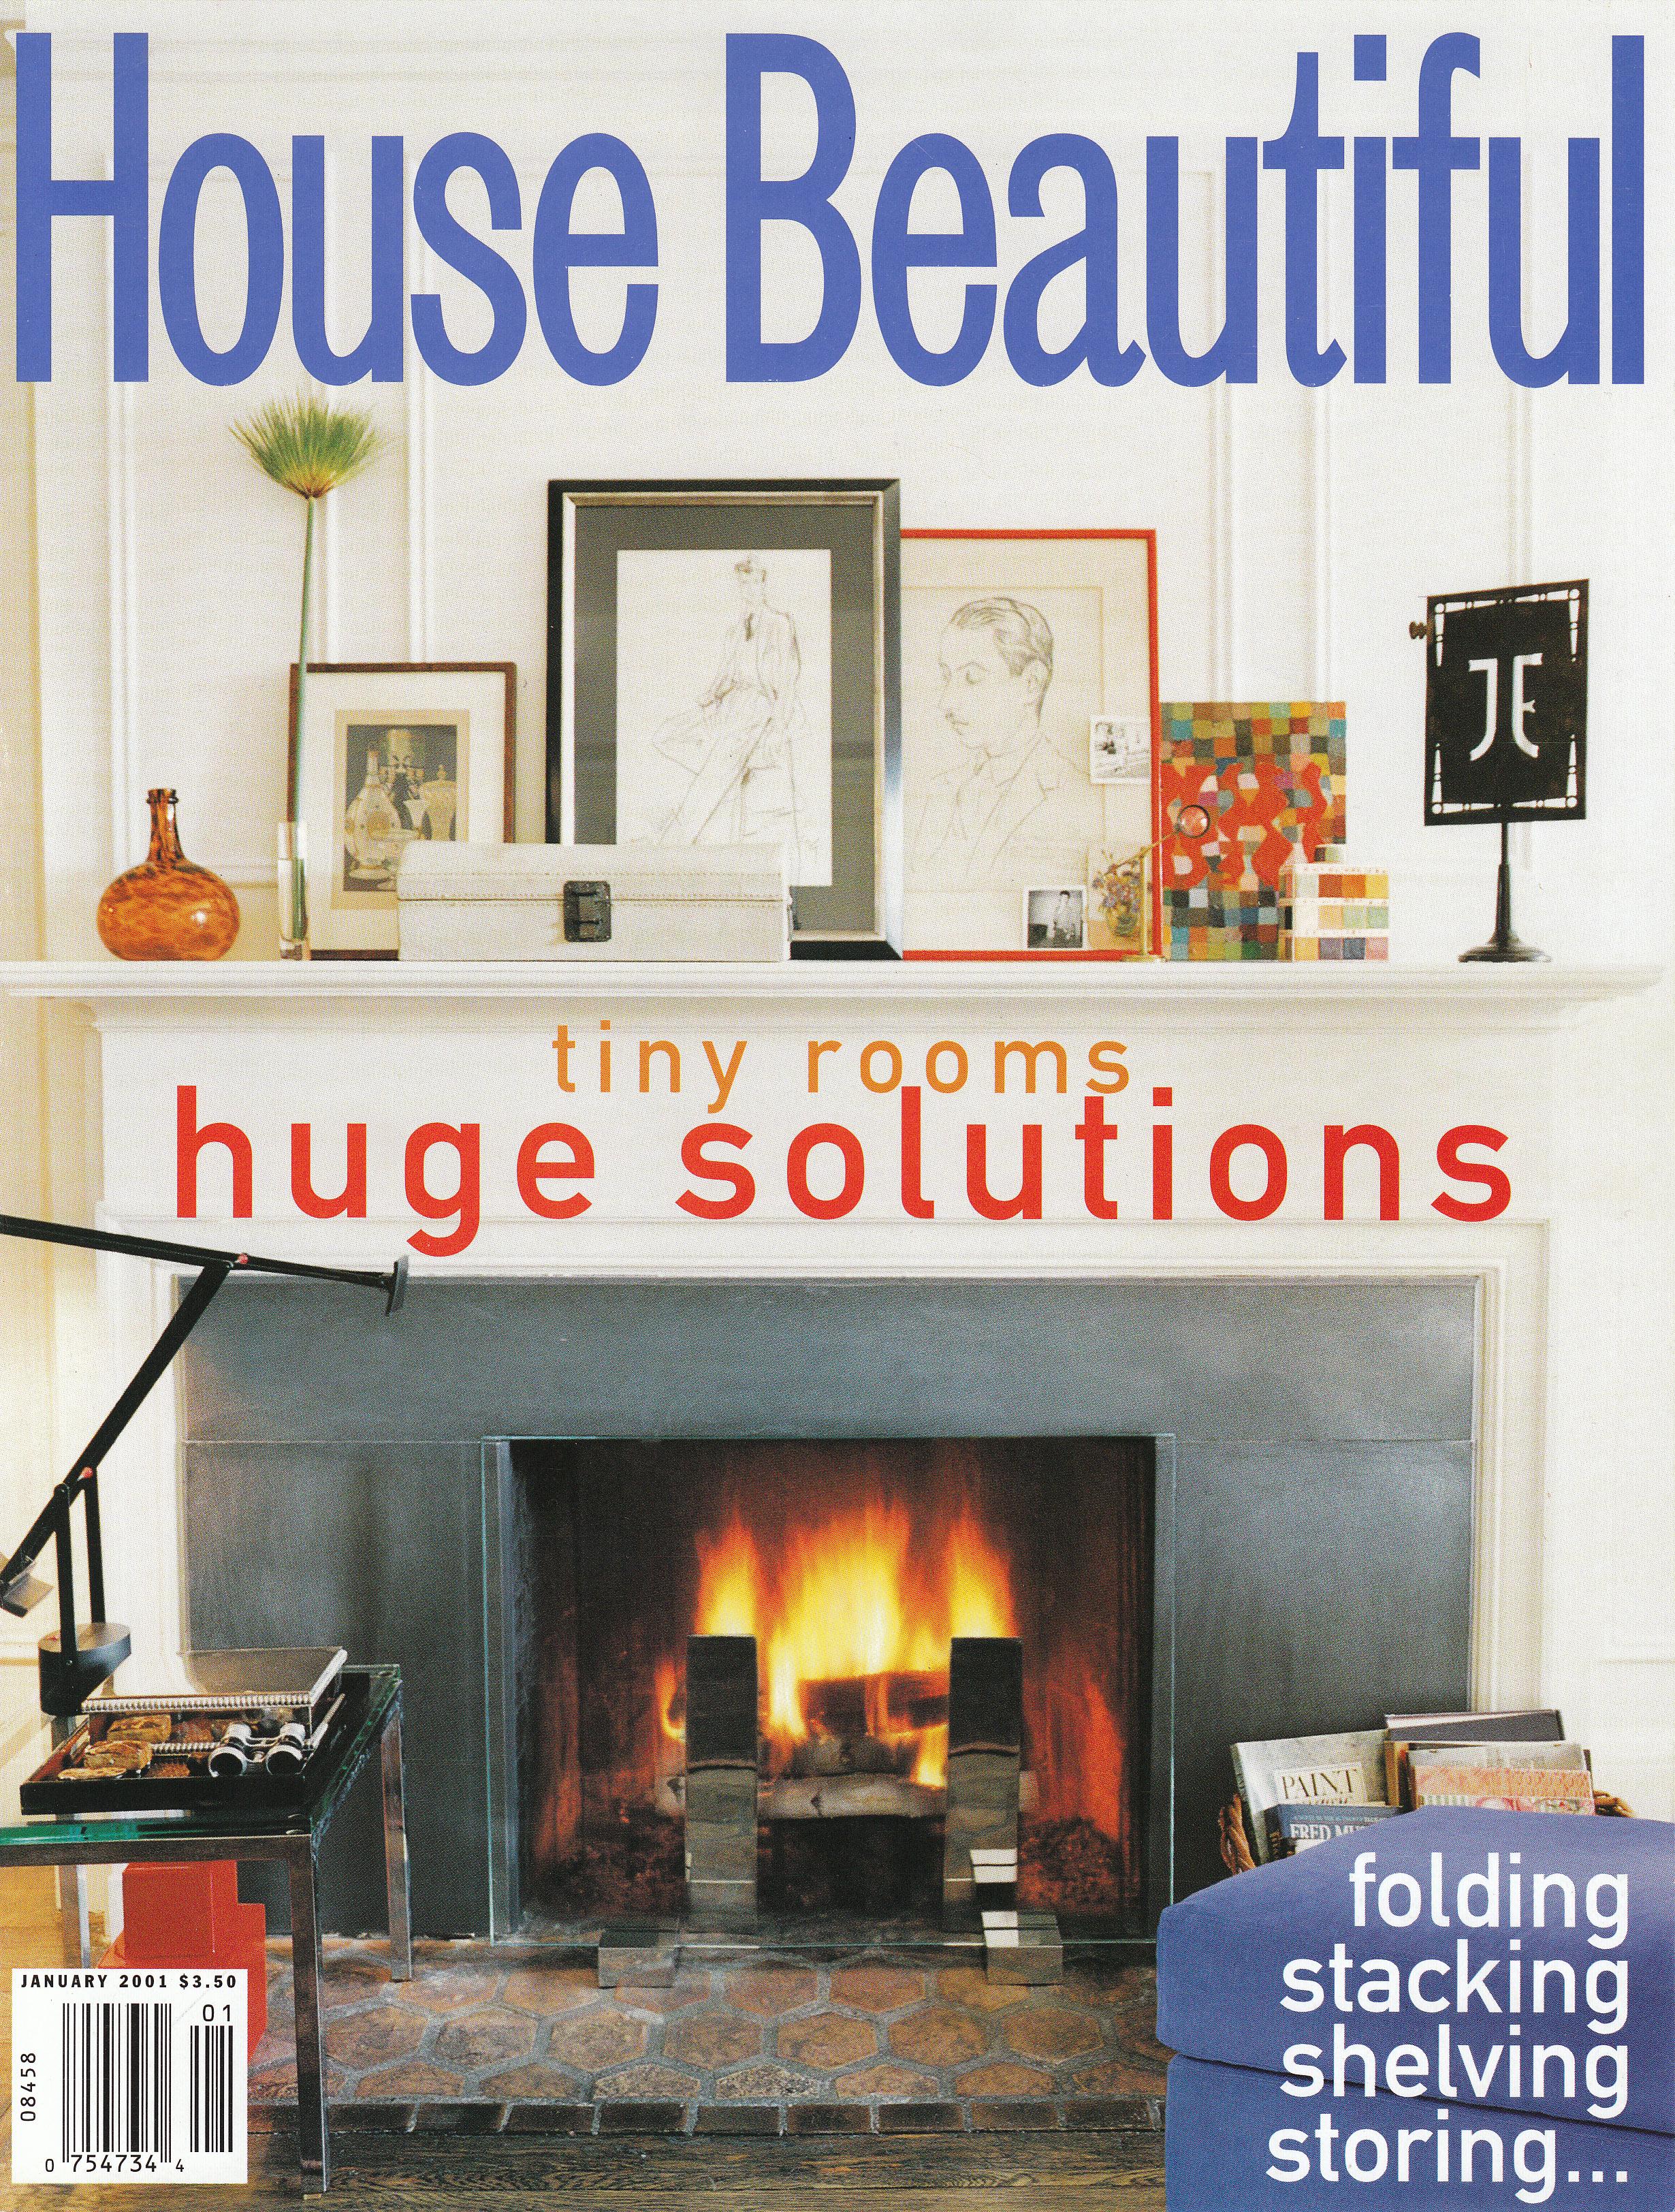 The House Beautiful studiolo furniture